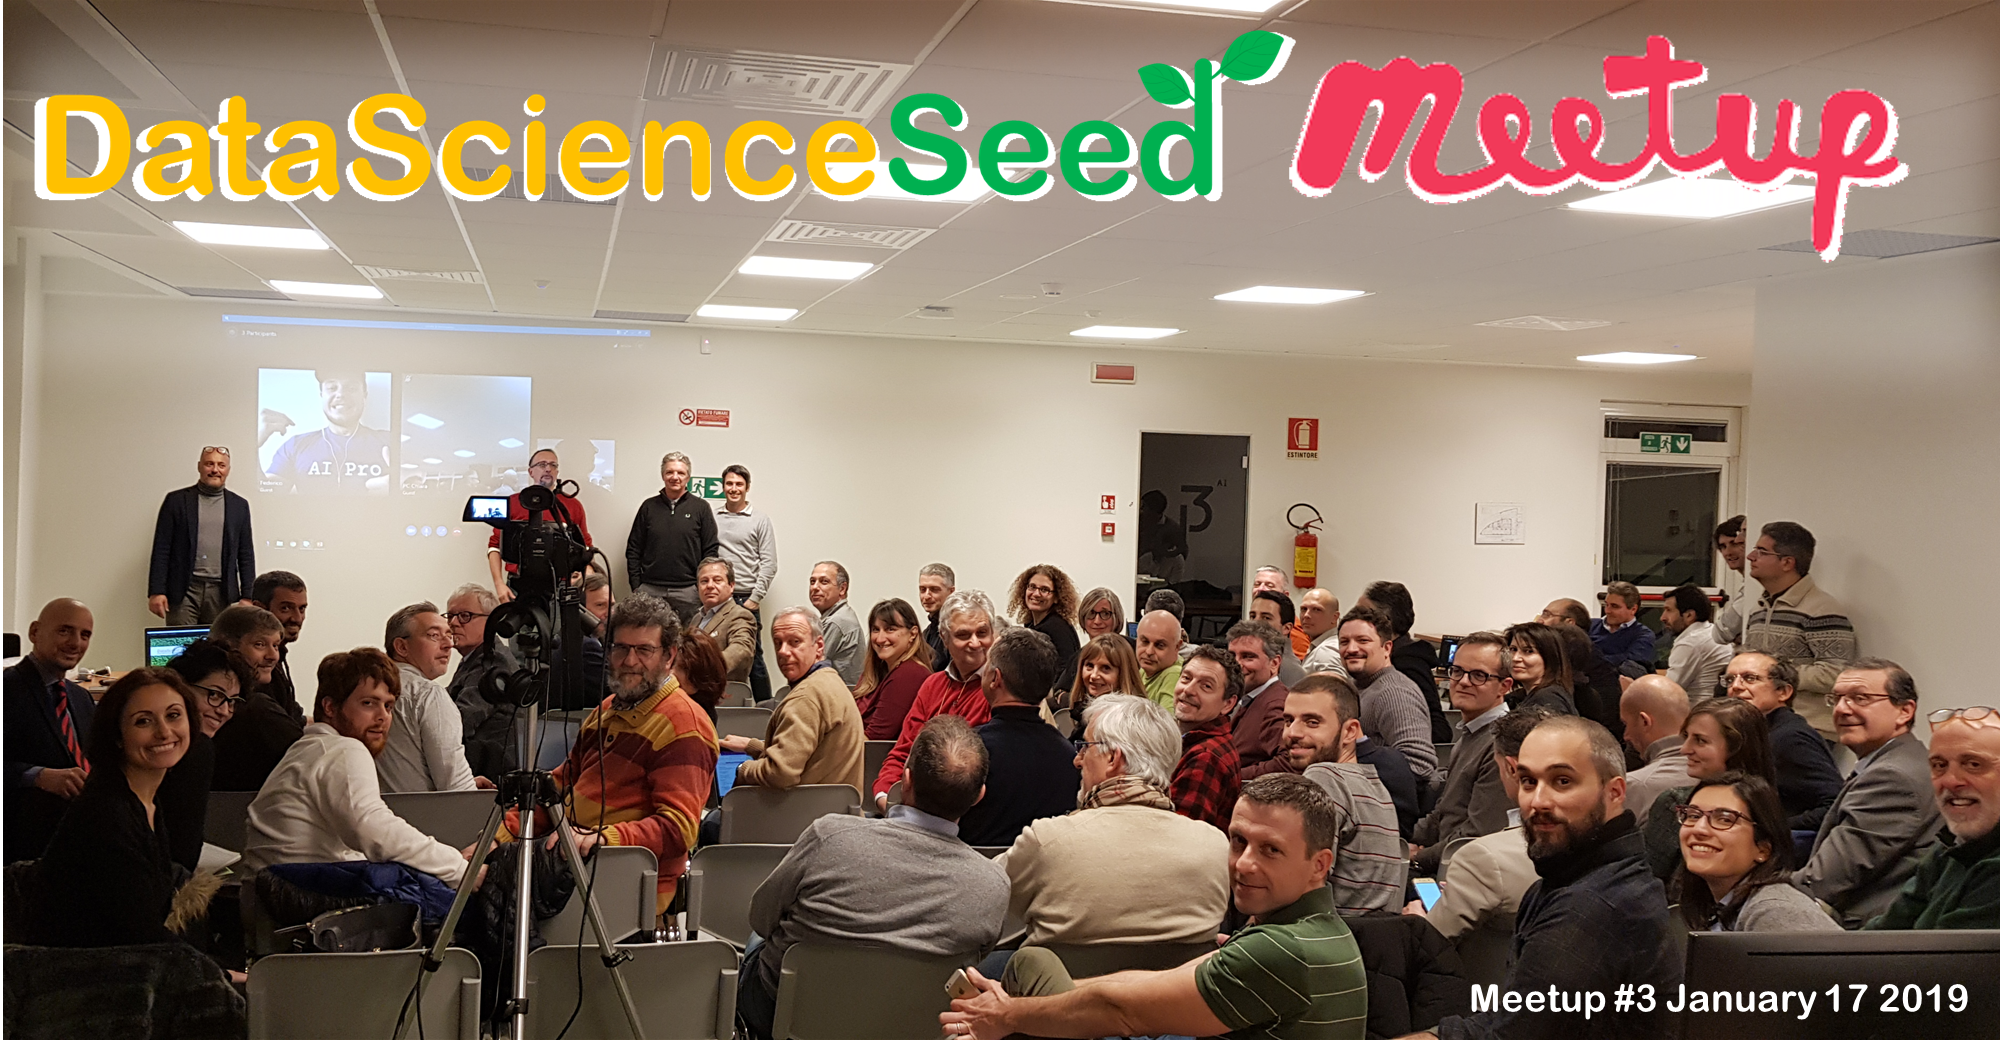 picture of DataScienceSeed Meetup in Genova